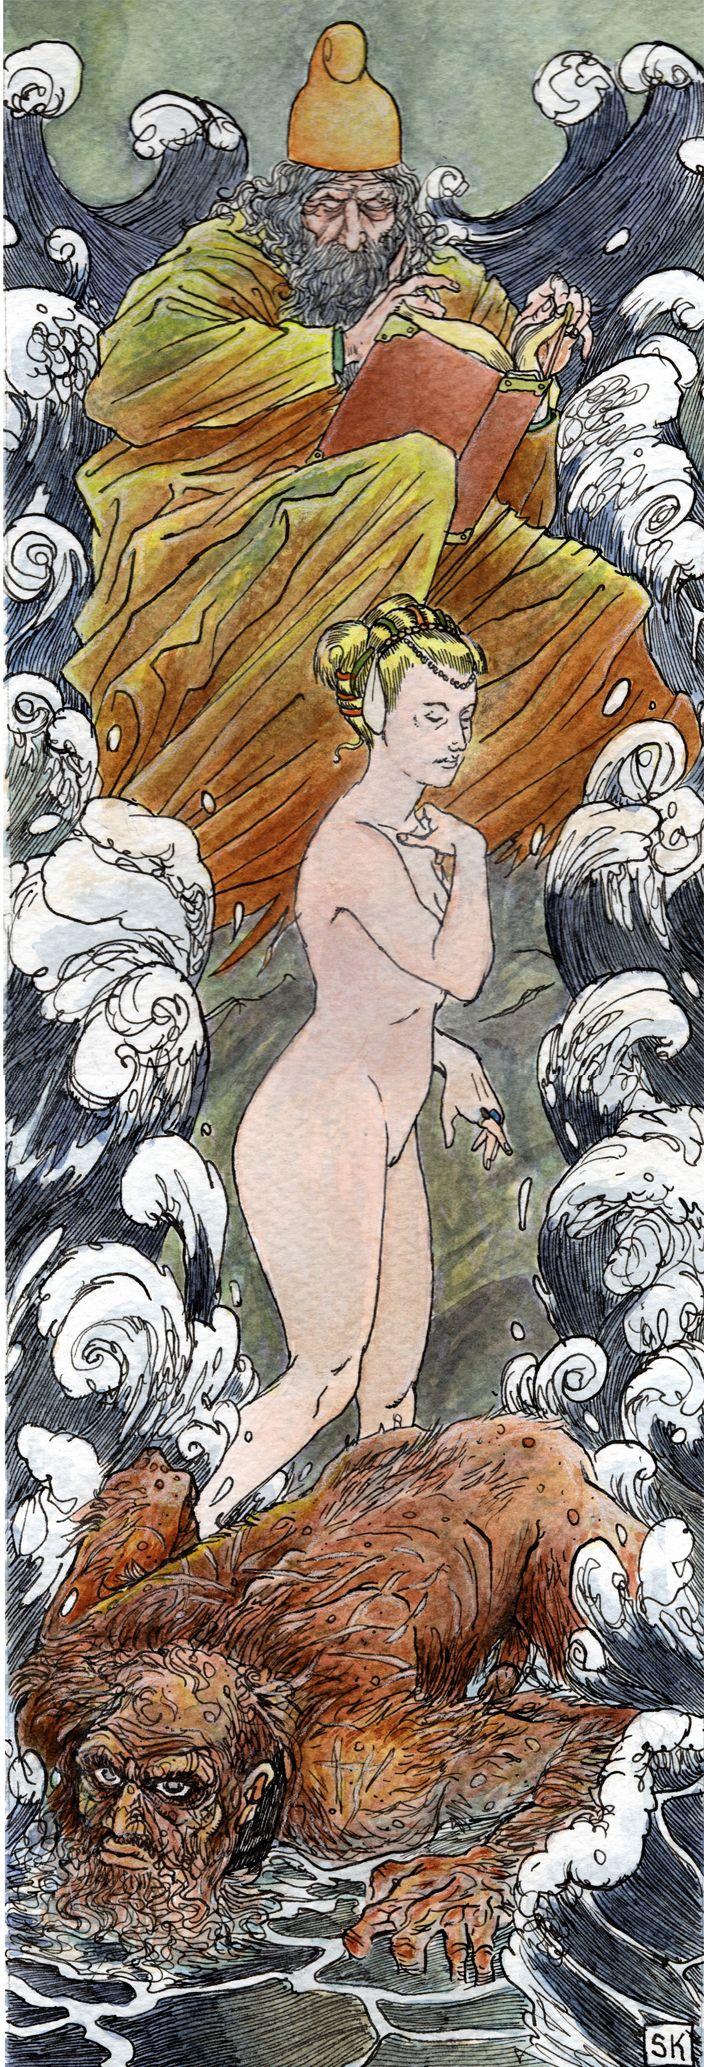 Bastian Kufper's The tempest, William Shakespeare. #bastiankupfer #shakespeare #thetempest #tempest #miranda #prospero #caliban #island #magic #fantasy #purcell #unconscious #literature #illustration #art #fabulantes